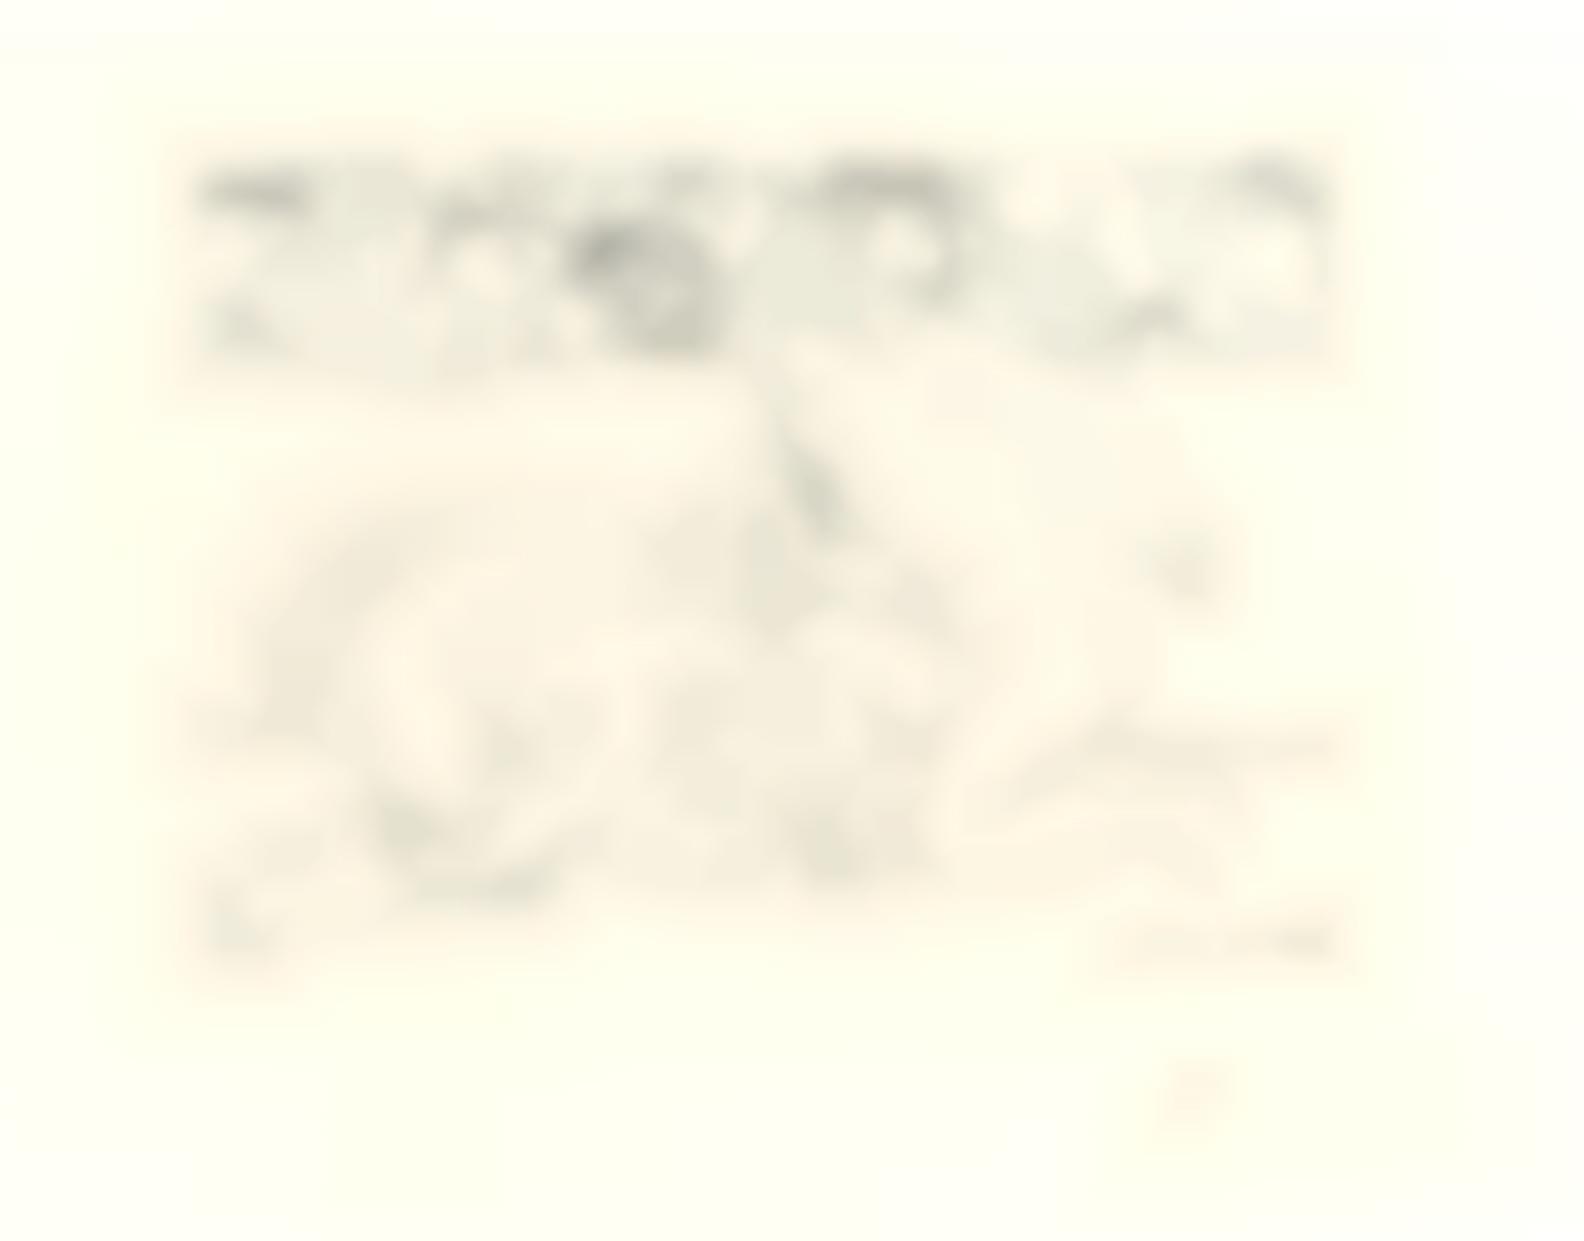 Pablo Picasso-Minotaure Vaincu, Pl. 89 From La Suite Vollard (B. 197; Ba. 365)-1933